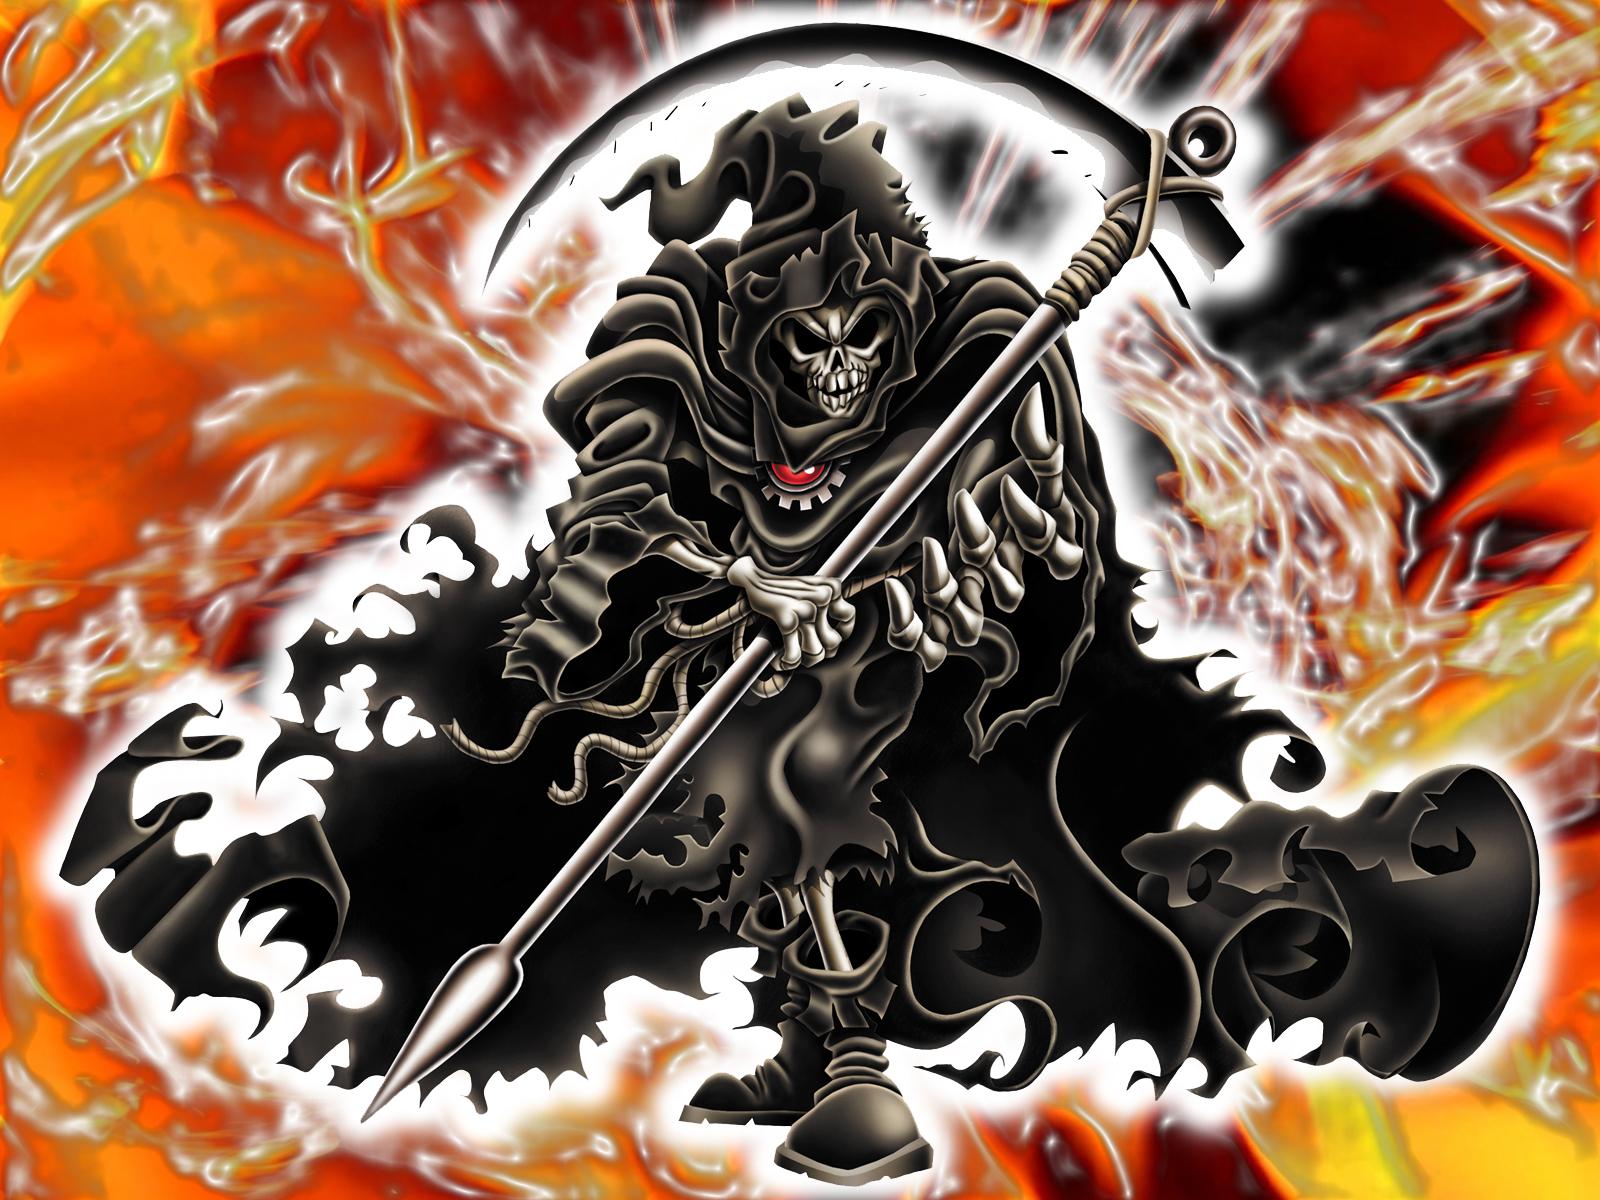 Grim reaper wallpaper and background image 1600x1200 - Reaper wallpaper ...